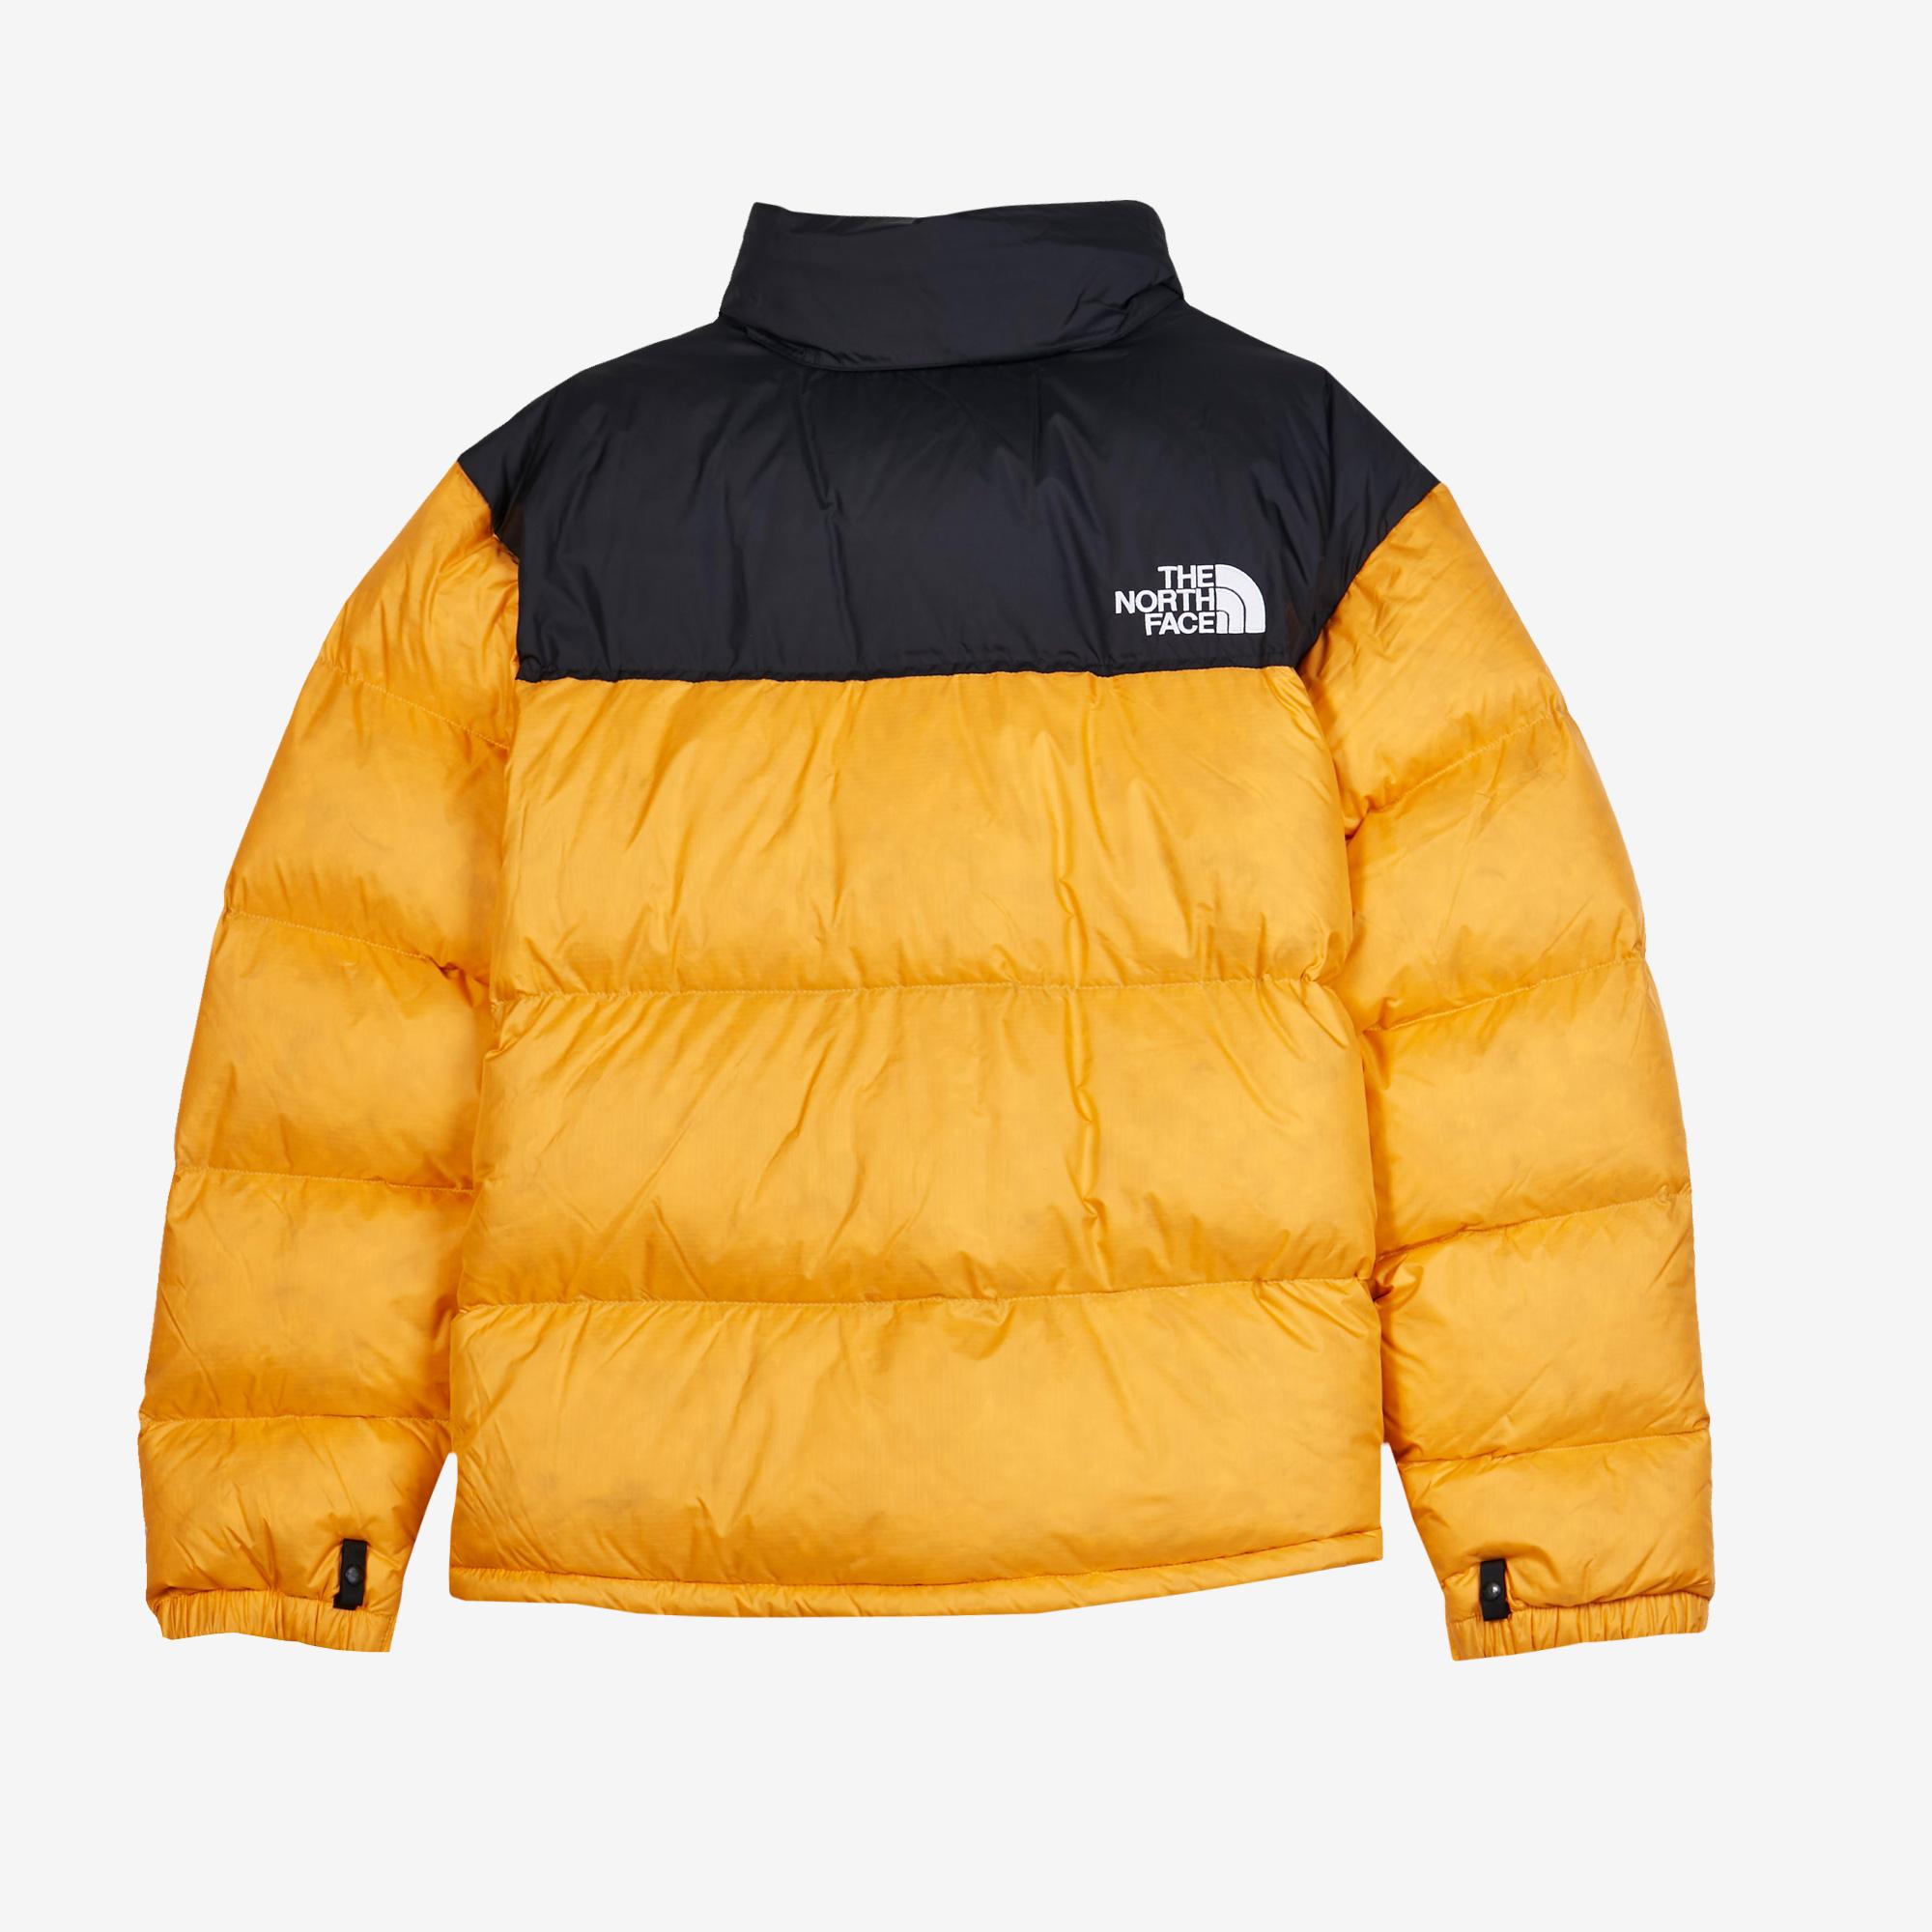 d2613d28af The North Face 1996 Retro Nuptse Jacket - T93c8dh6g ...